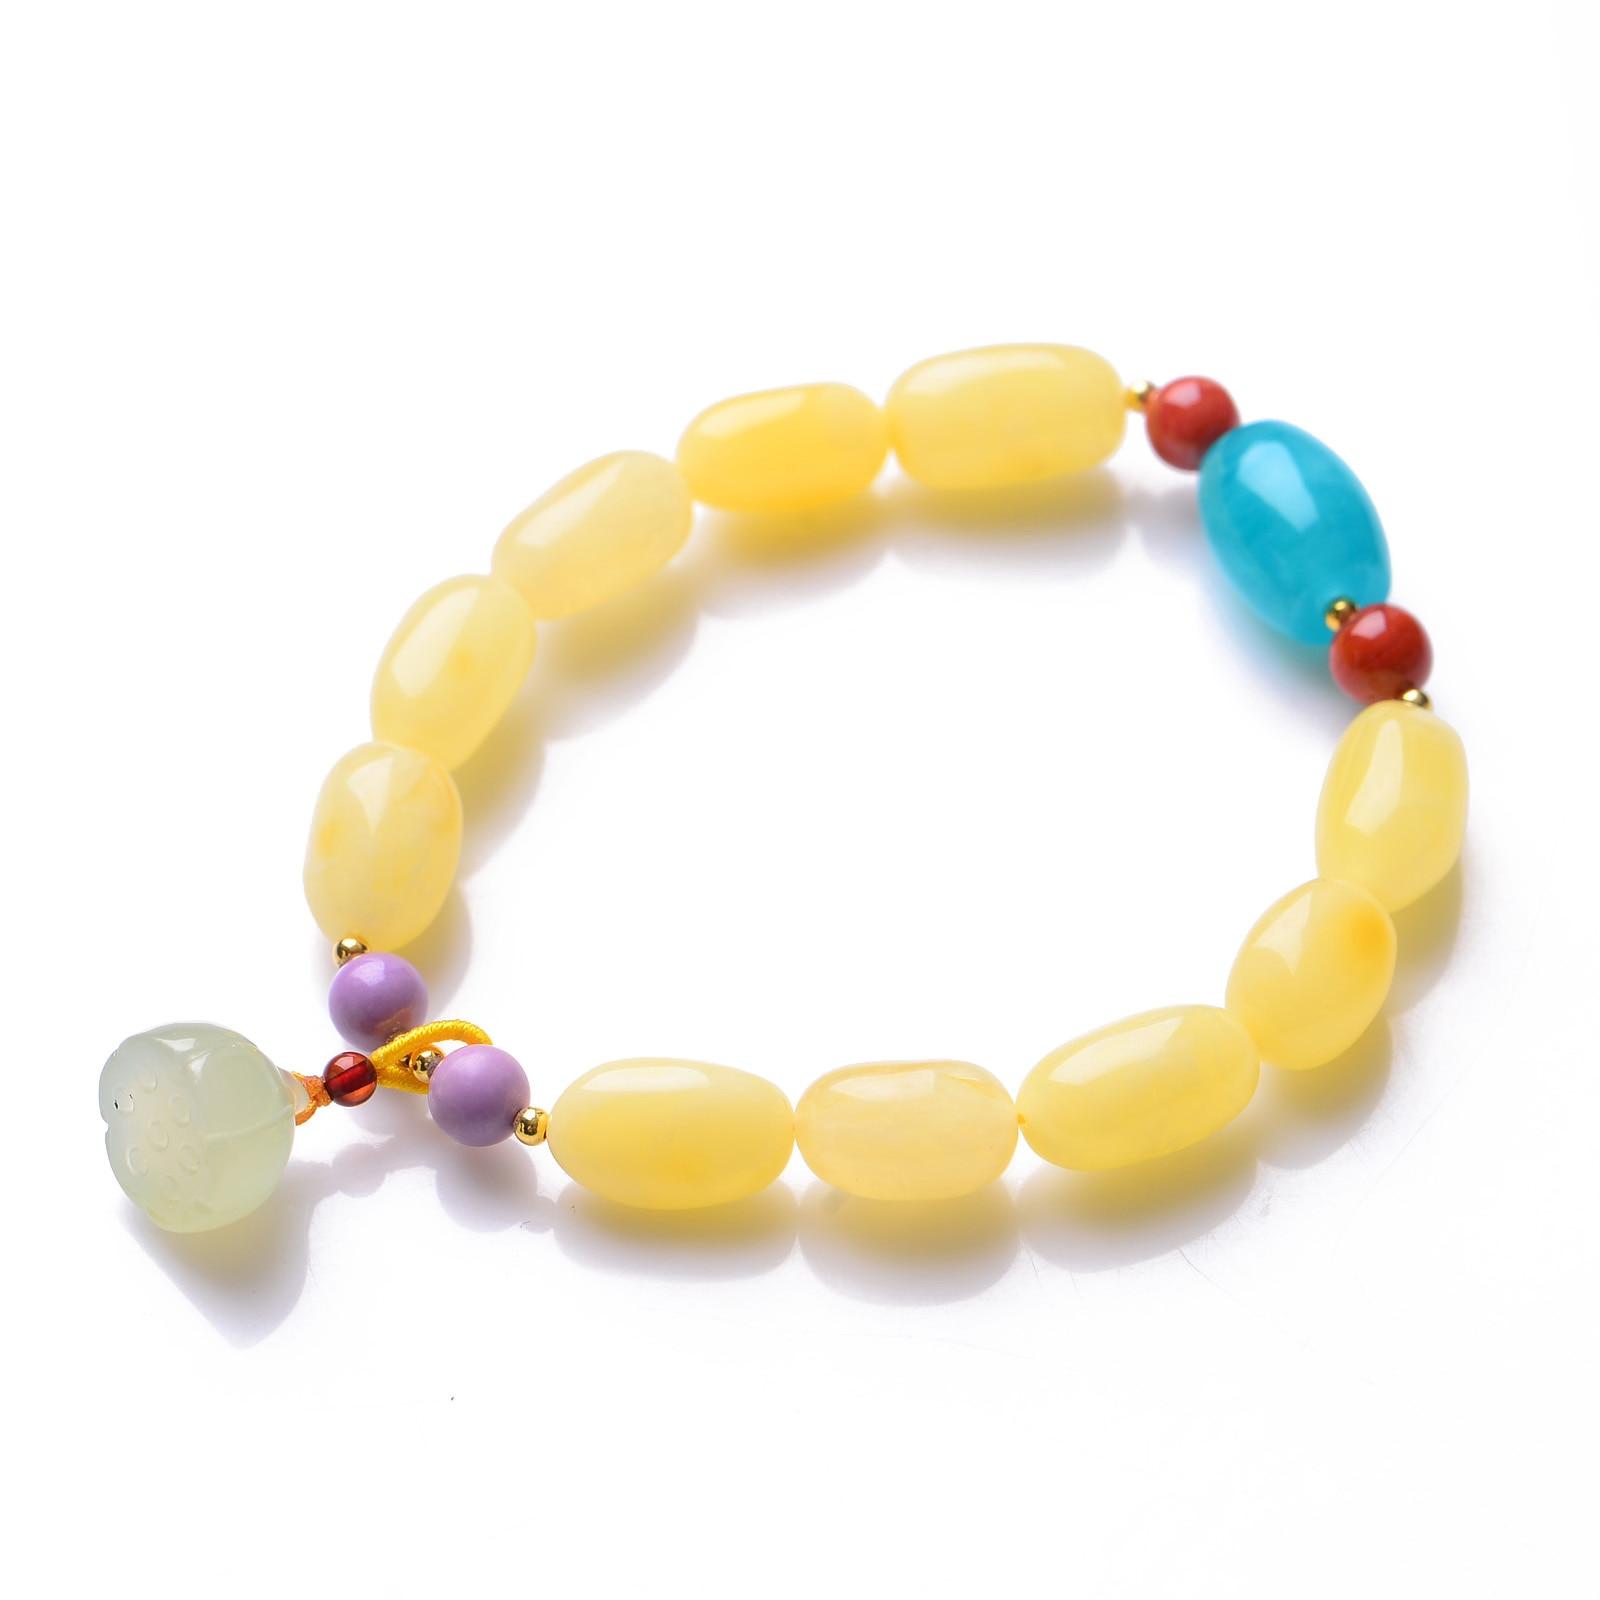 Handmade Authentic Wax Bracelets handmade authentic wax bracelets